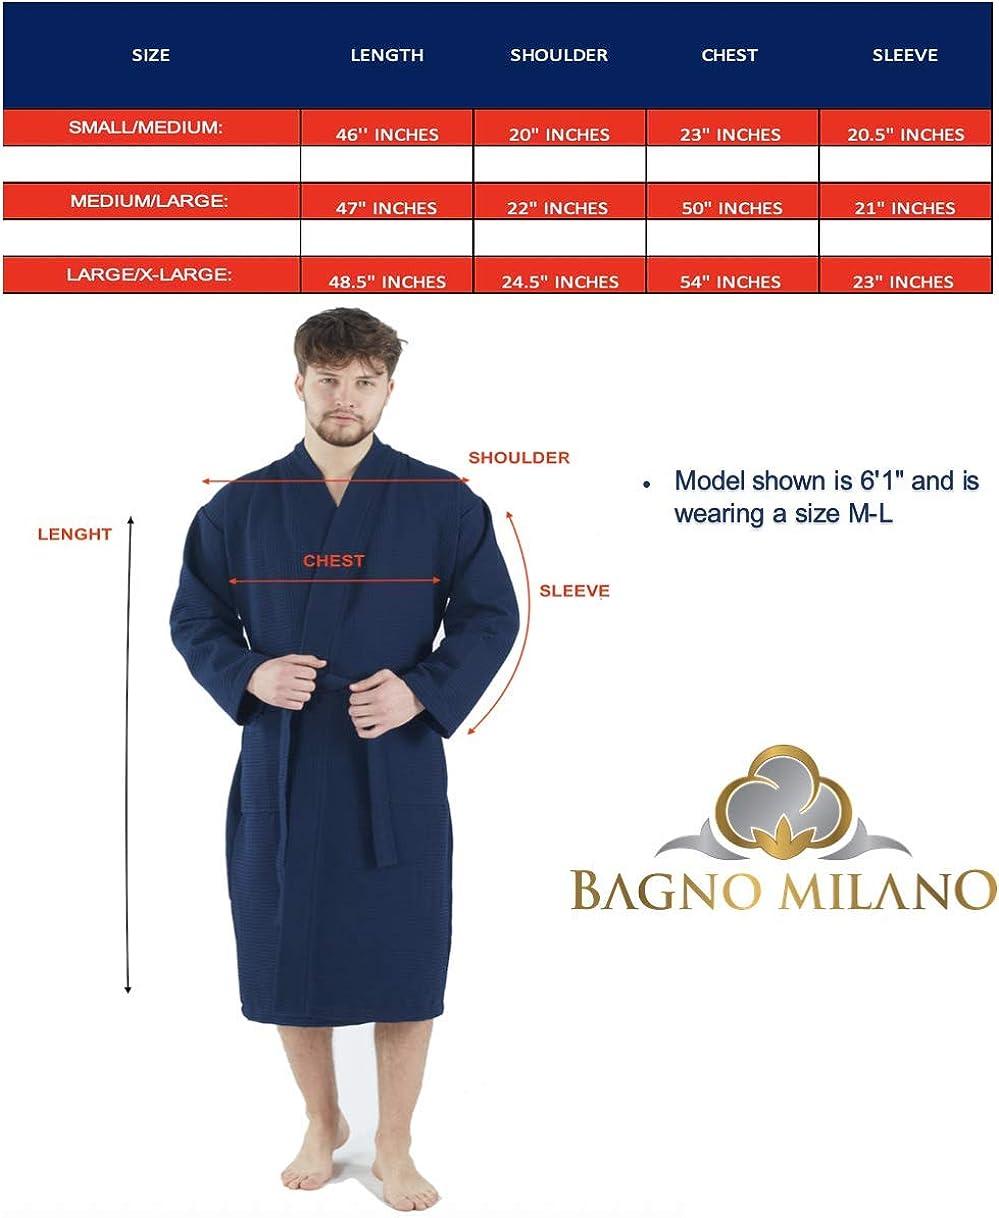 Made in Turkey Bagno Milano Mens Waffle-Knit Bathrobe Lightweight Hotel Spa Robe